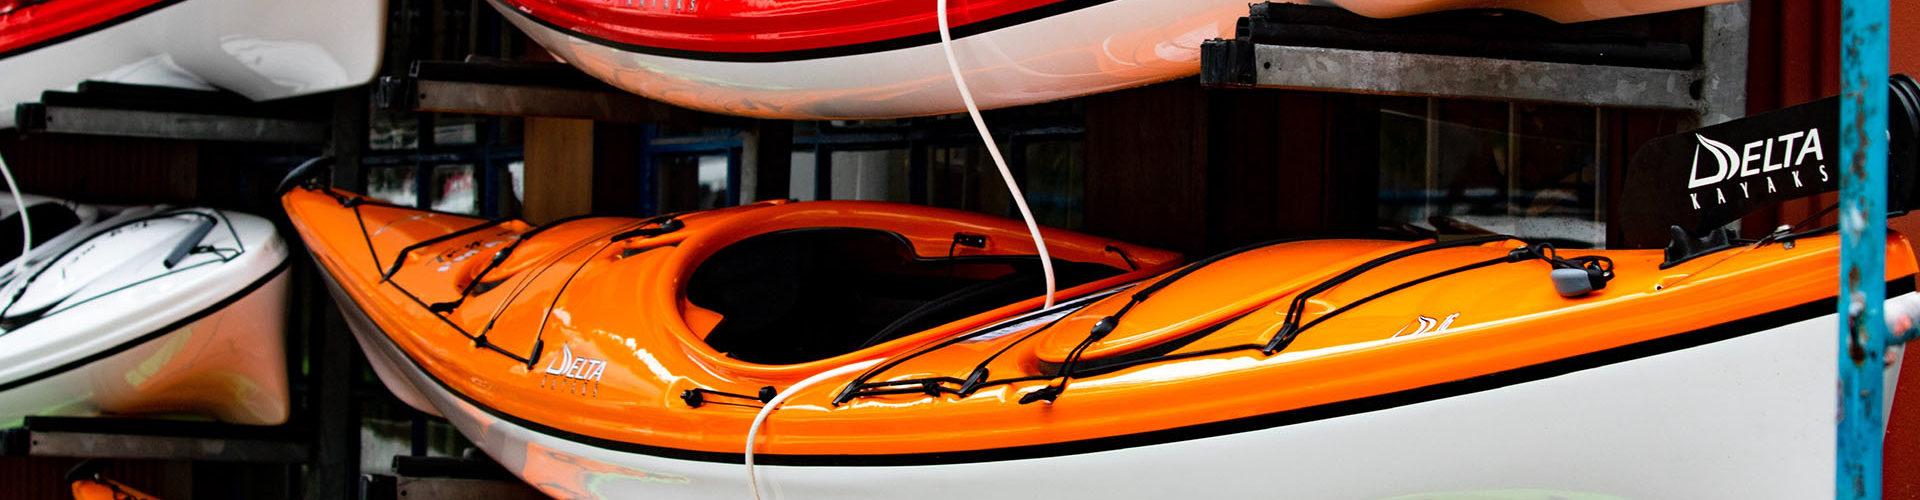 41+ Kayak Storage Rack Nz Images